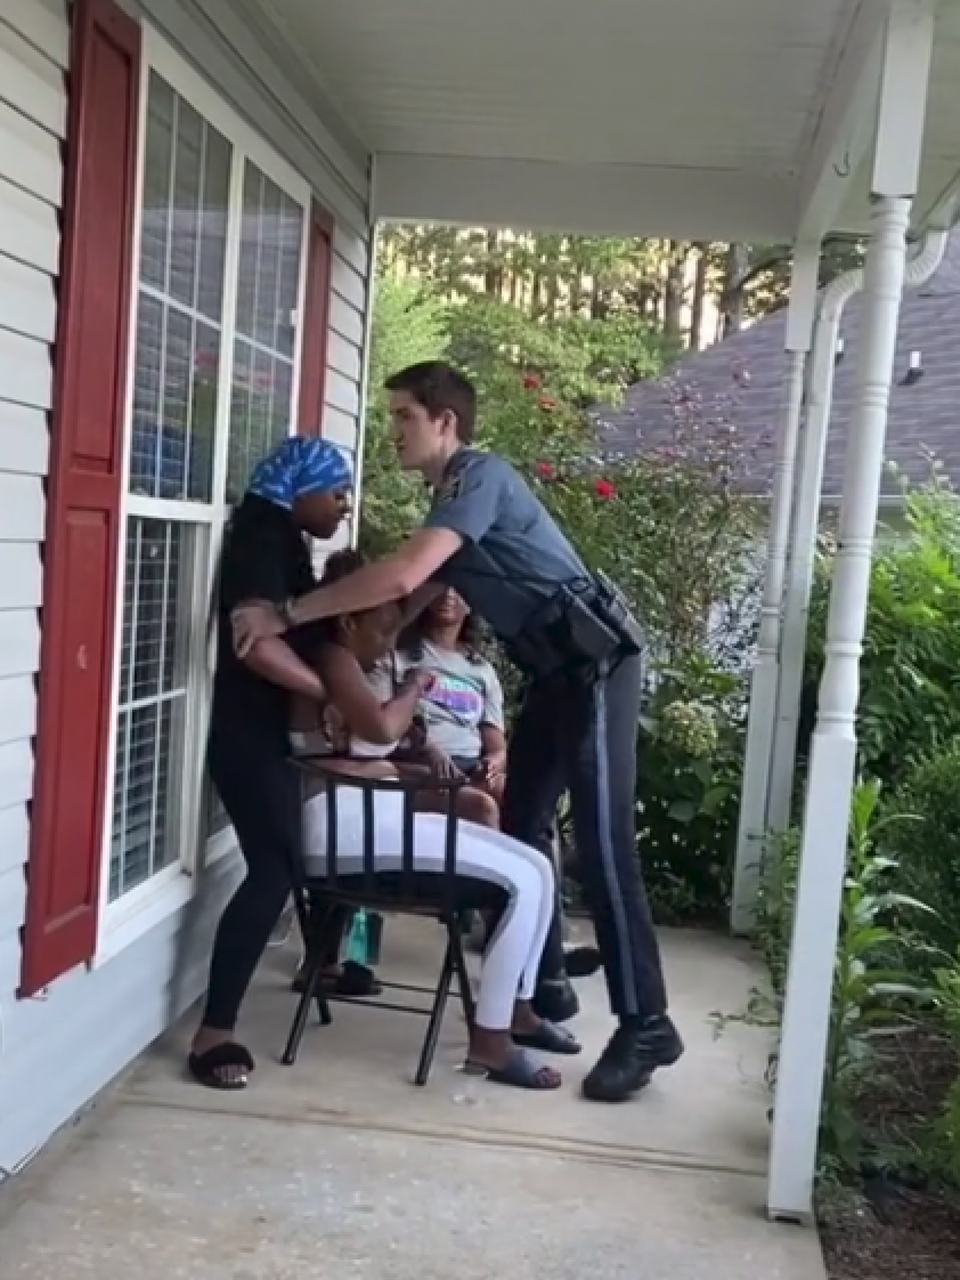 Georgia Cop On Desk Duty After Arresting, Tasing Woman On Porch